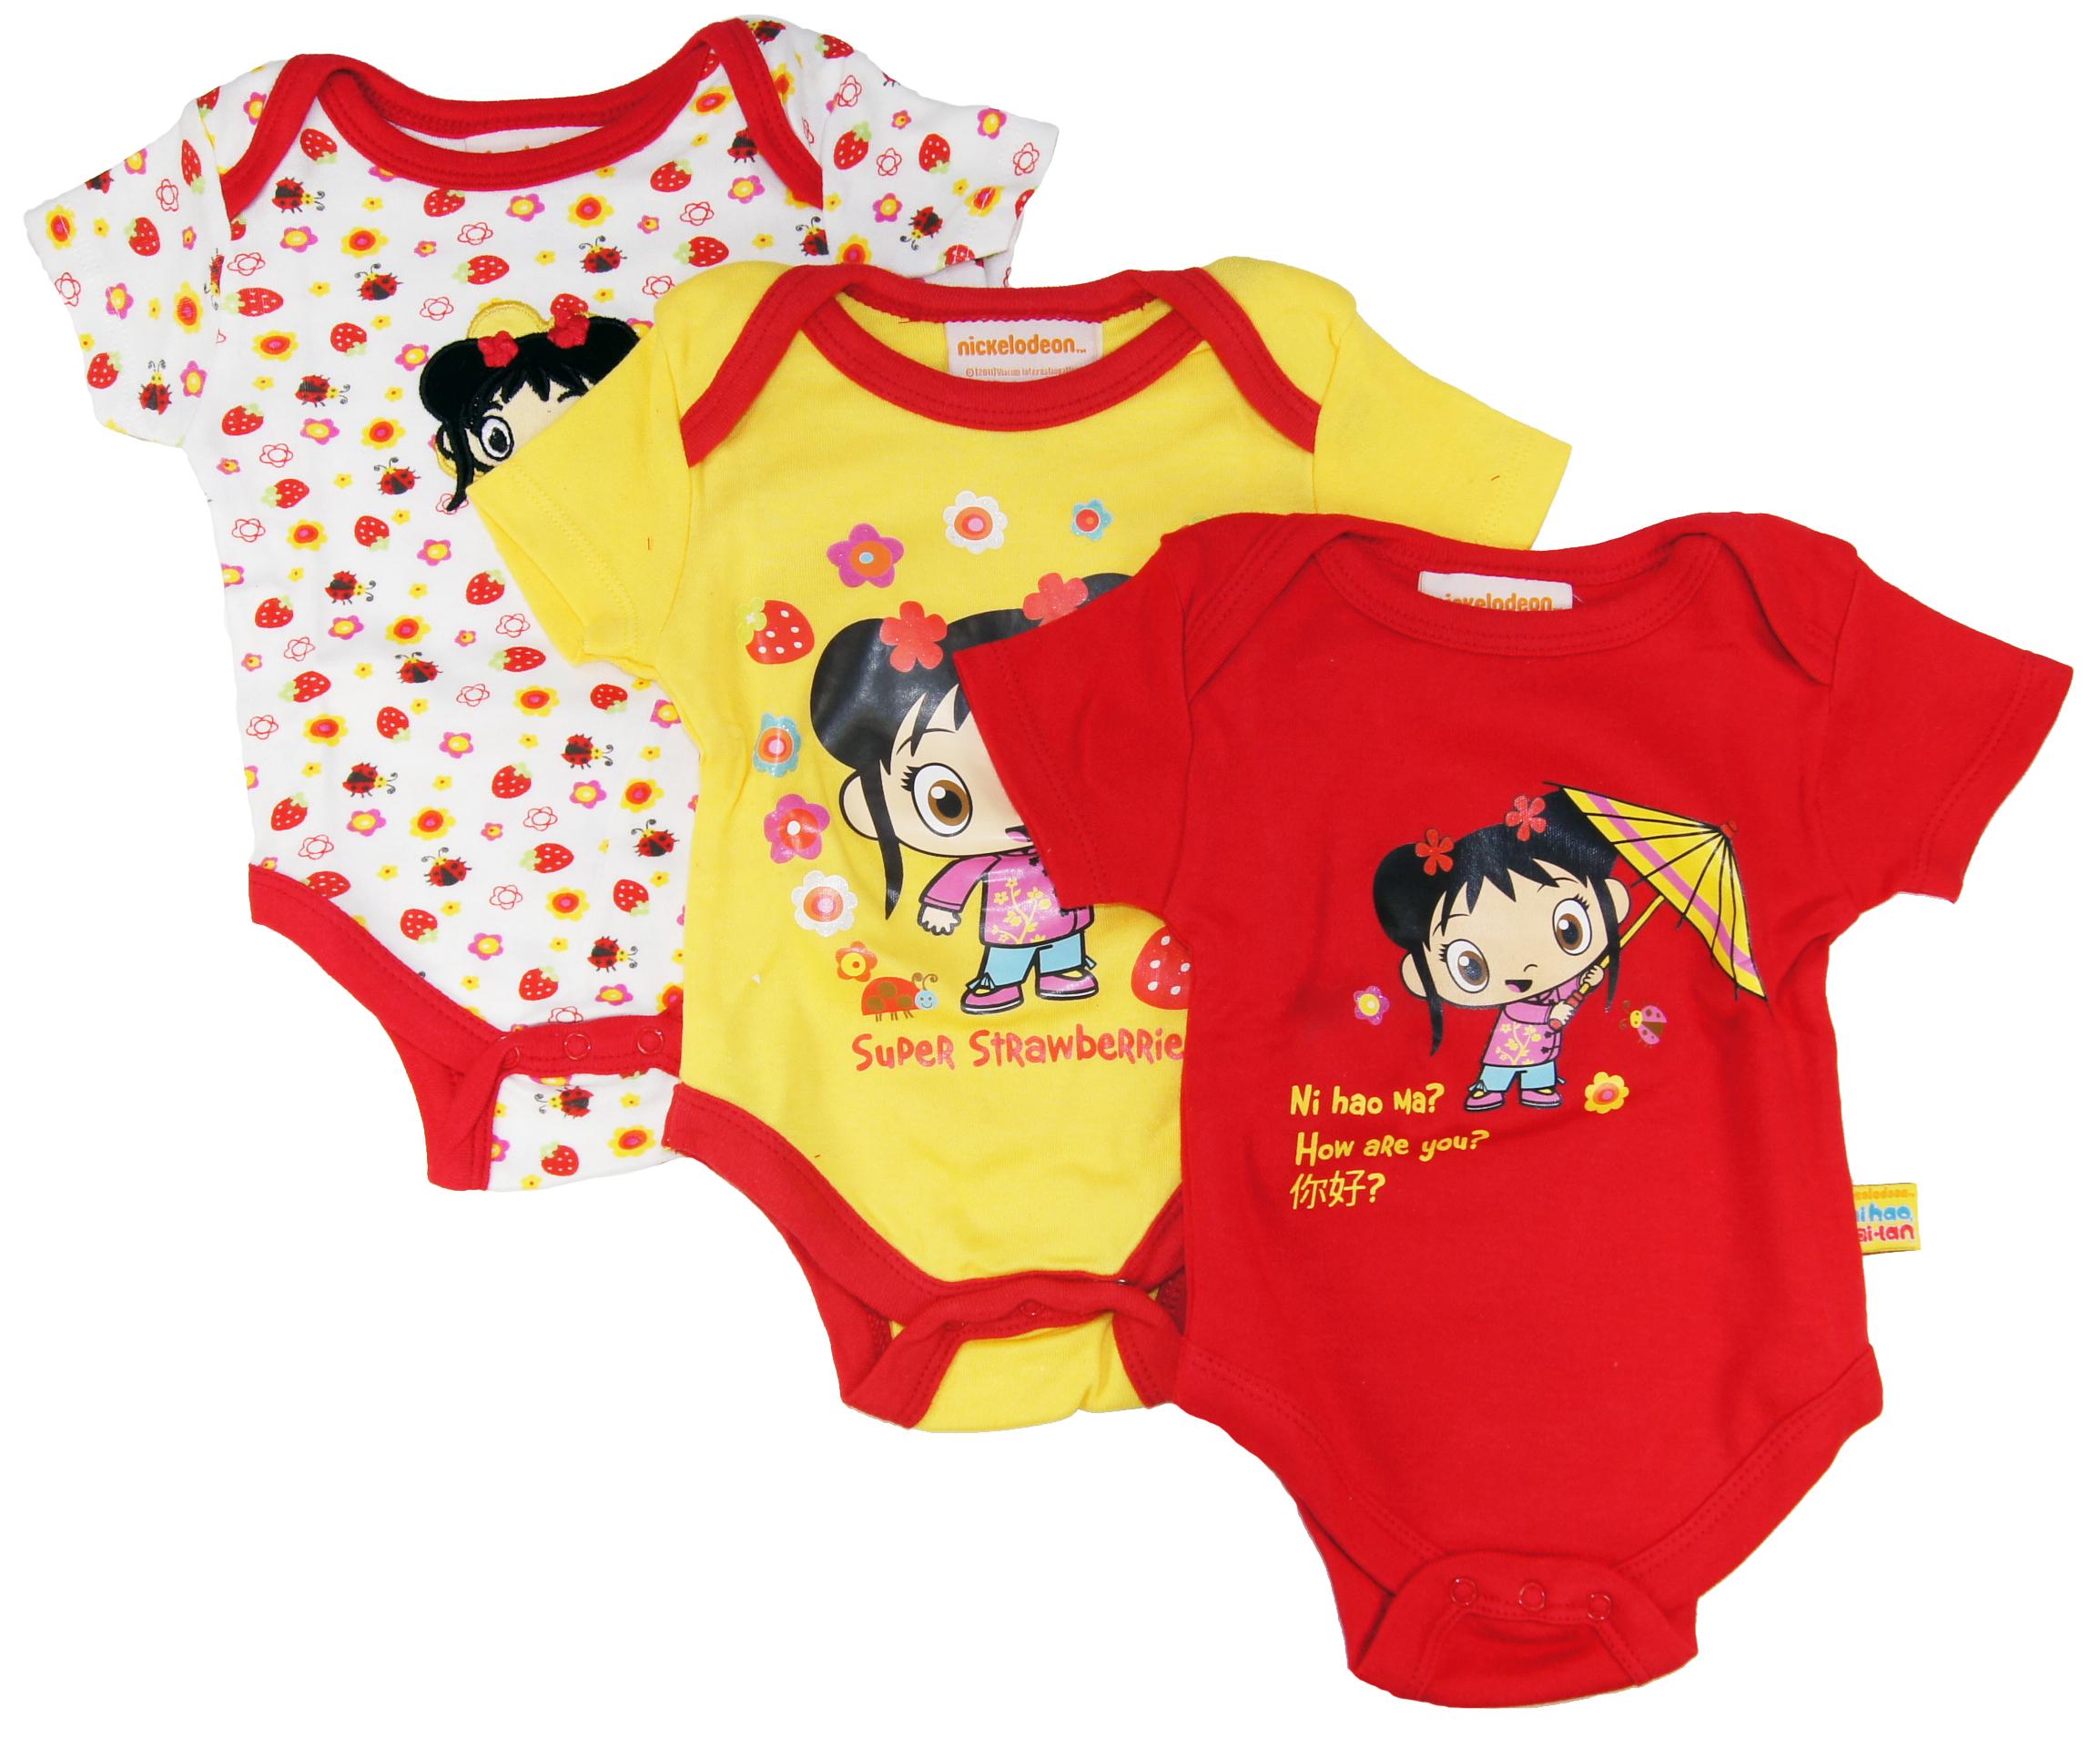 Nickelodeon Ni Hao Kai-Lan Newborn Baby-Grils Cotton Creepers-Bodysuit 3Pc Set at Sears.com